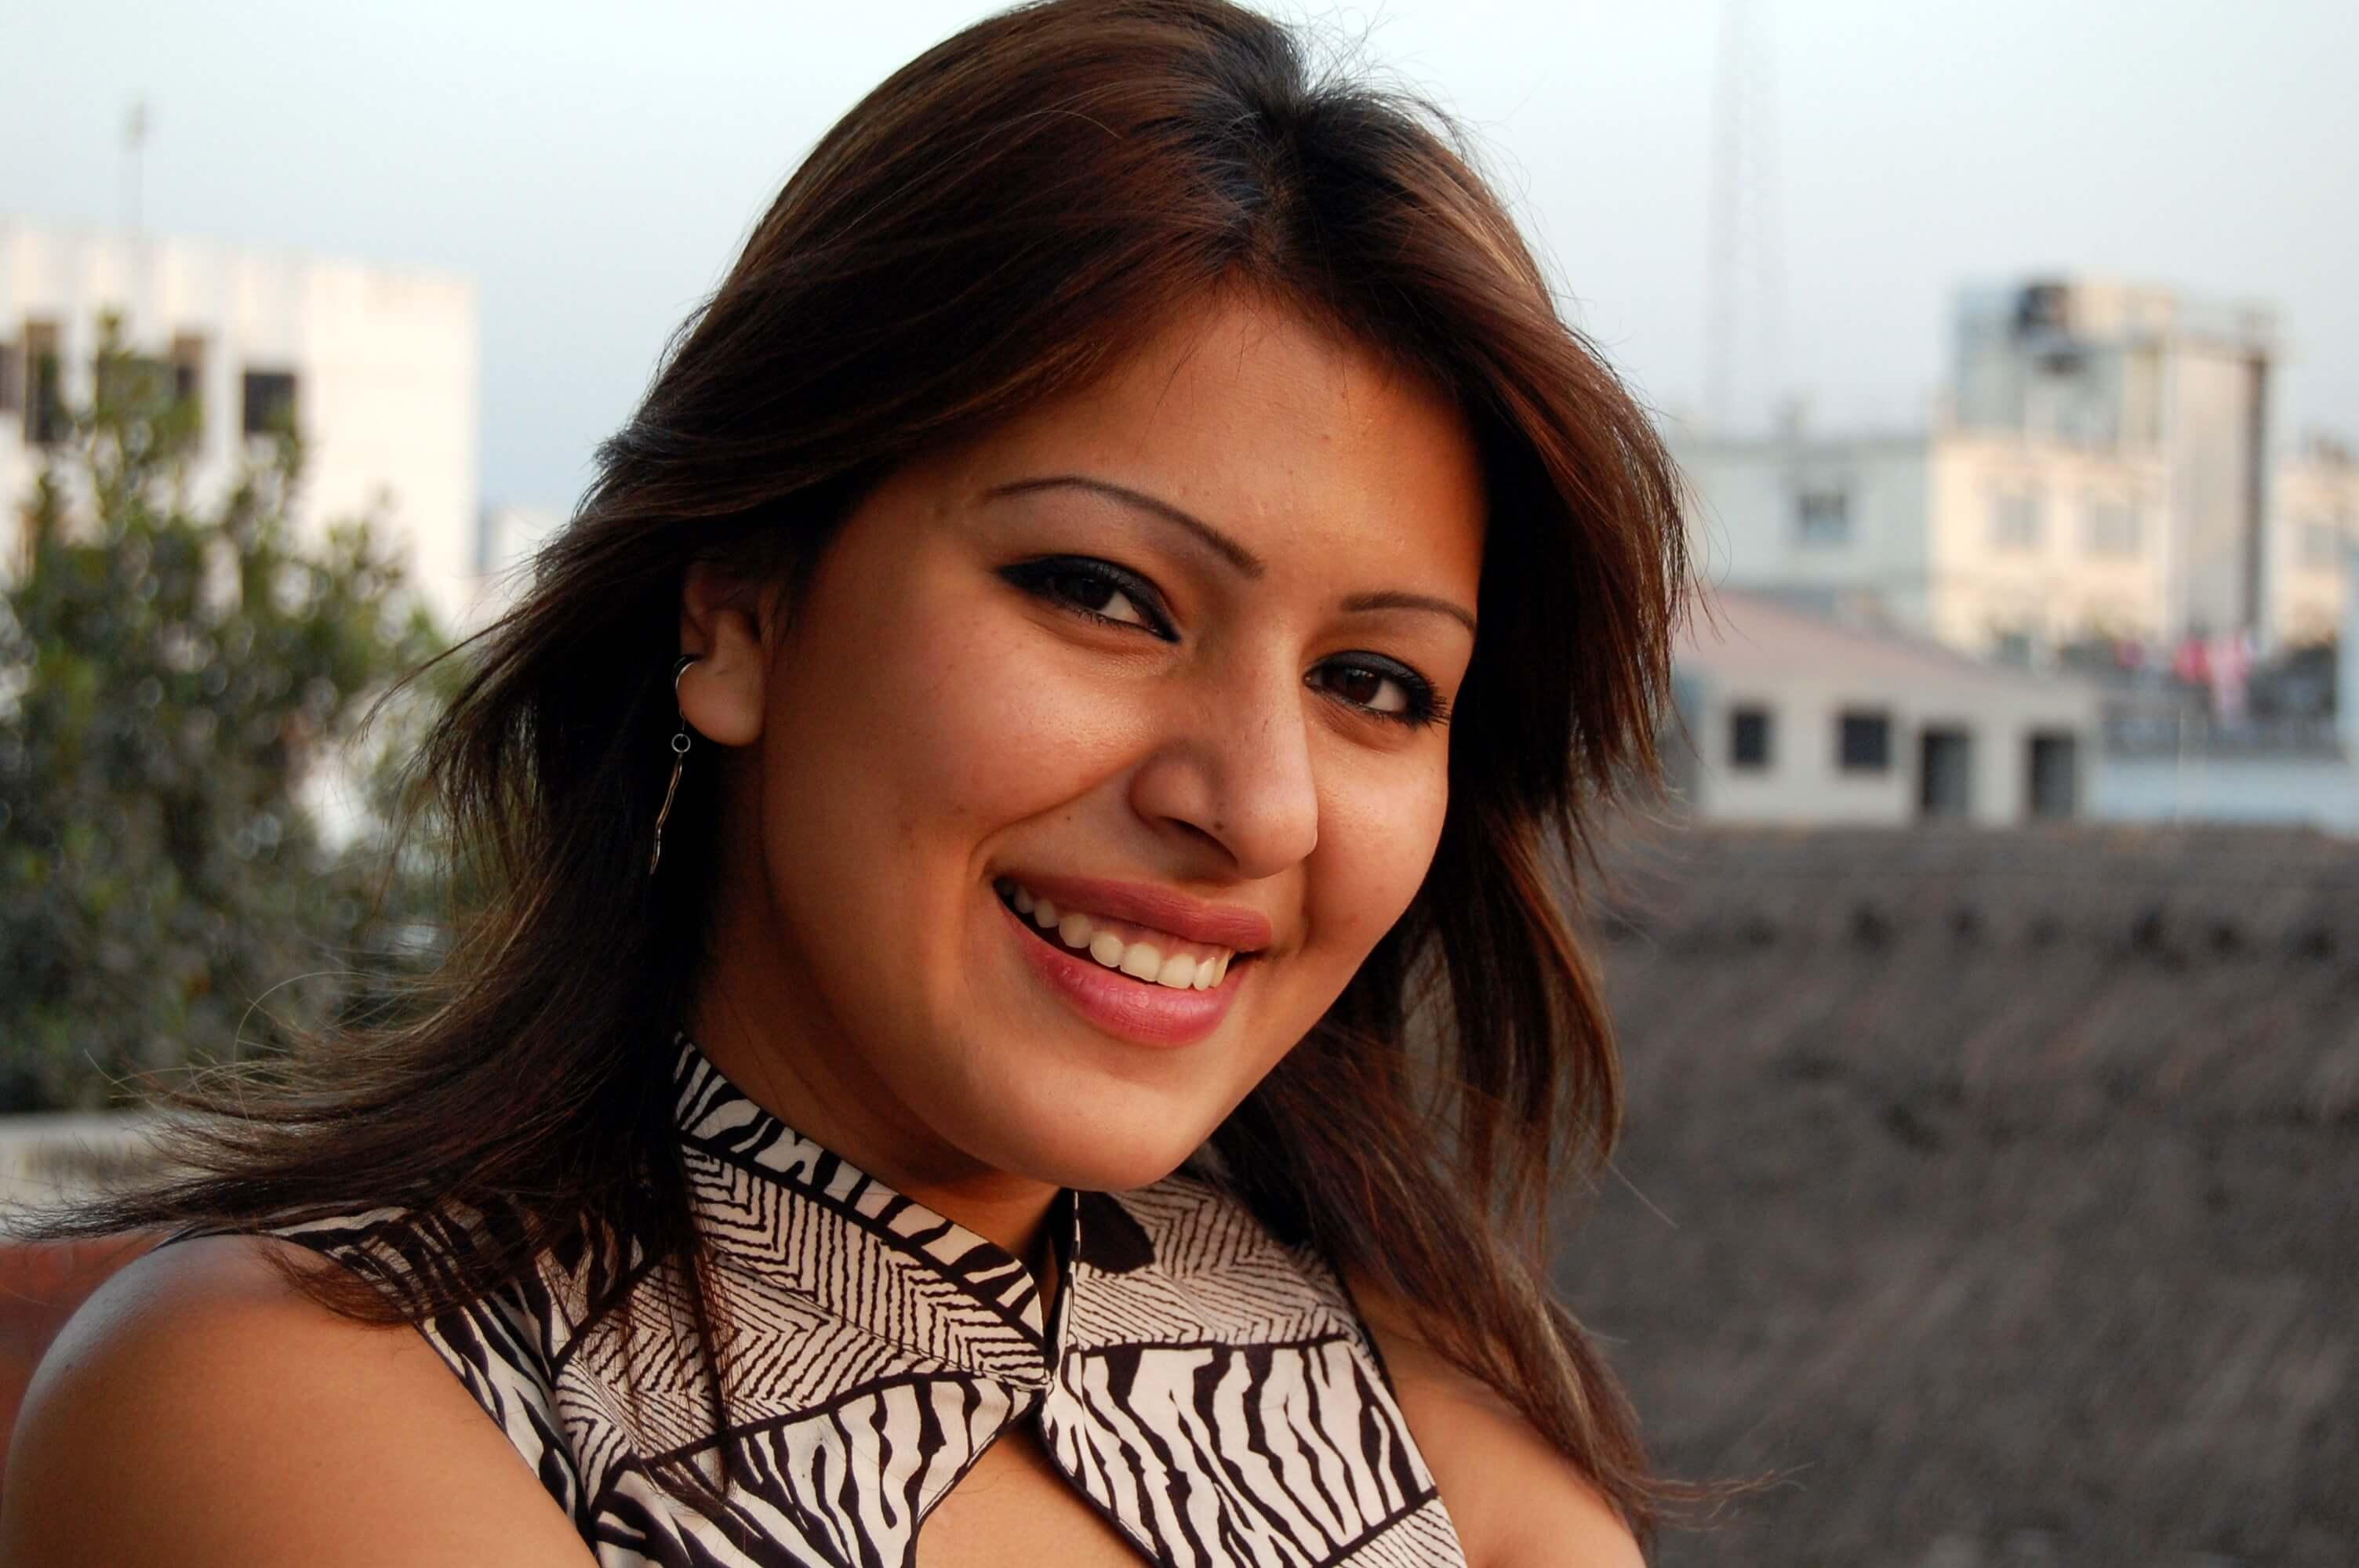 Srabosti Dutta Tinni